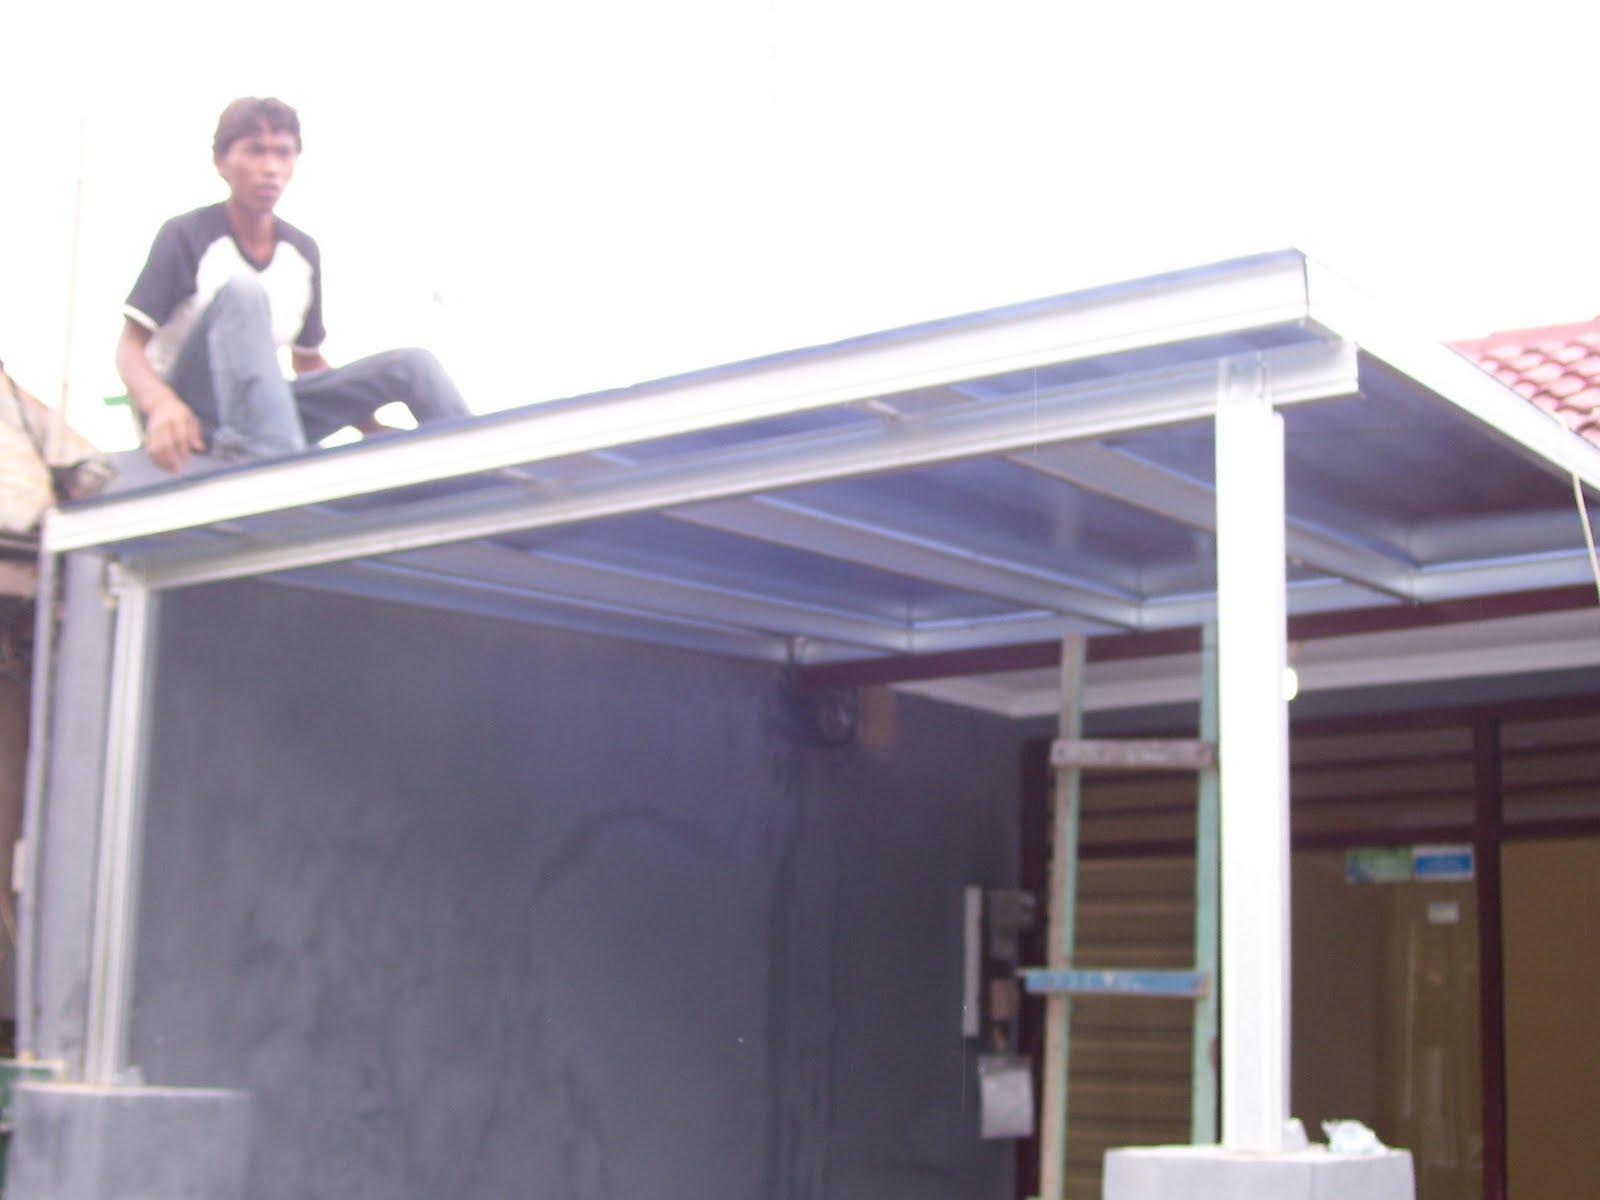 Kanopi Baja Design Rangka Atap Ringan , Arsitecture & Interior ...